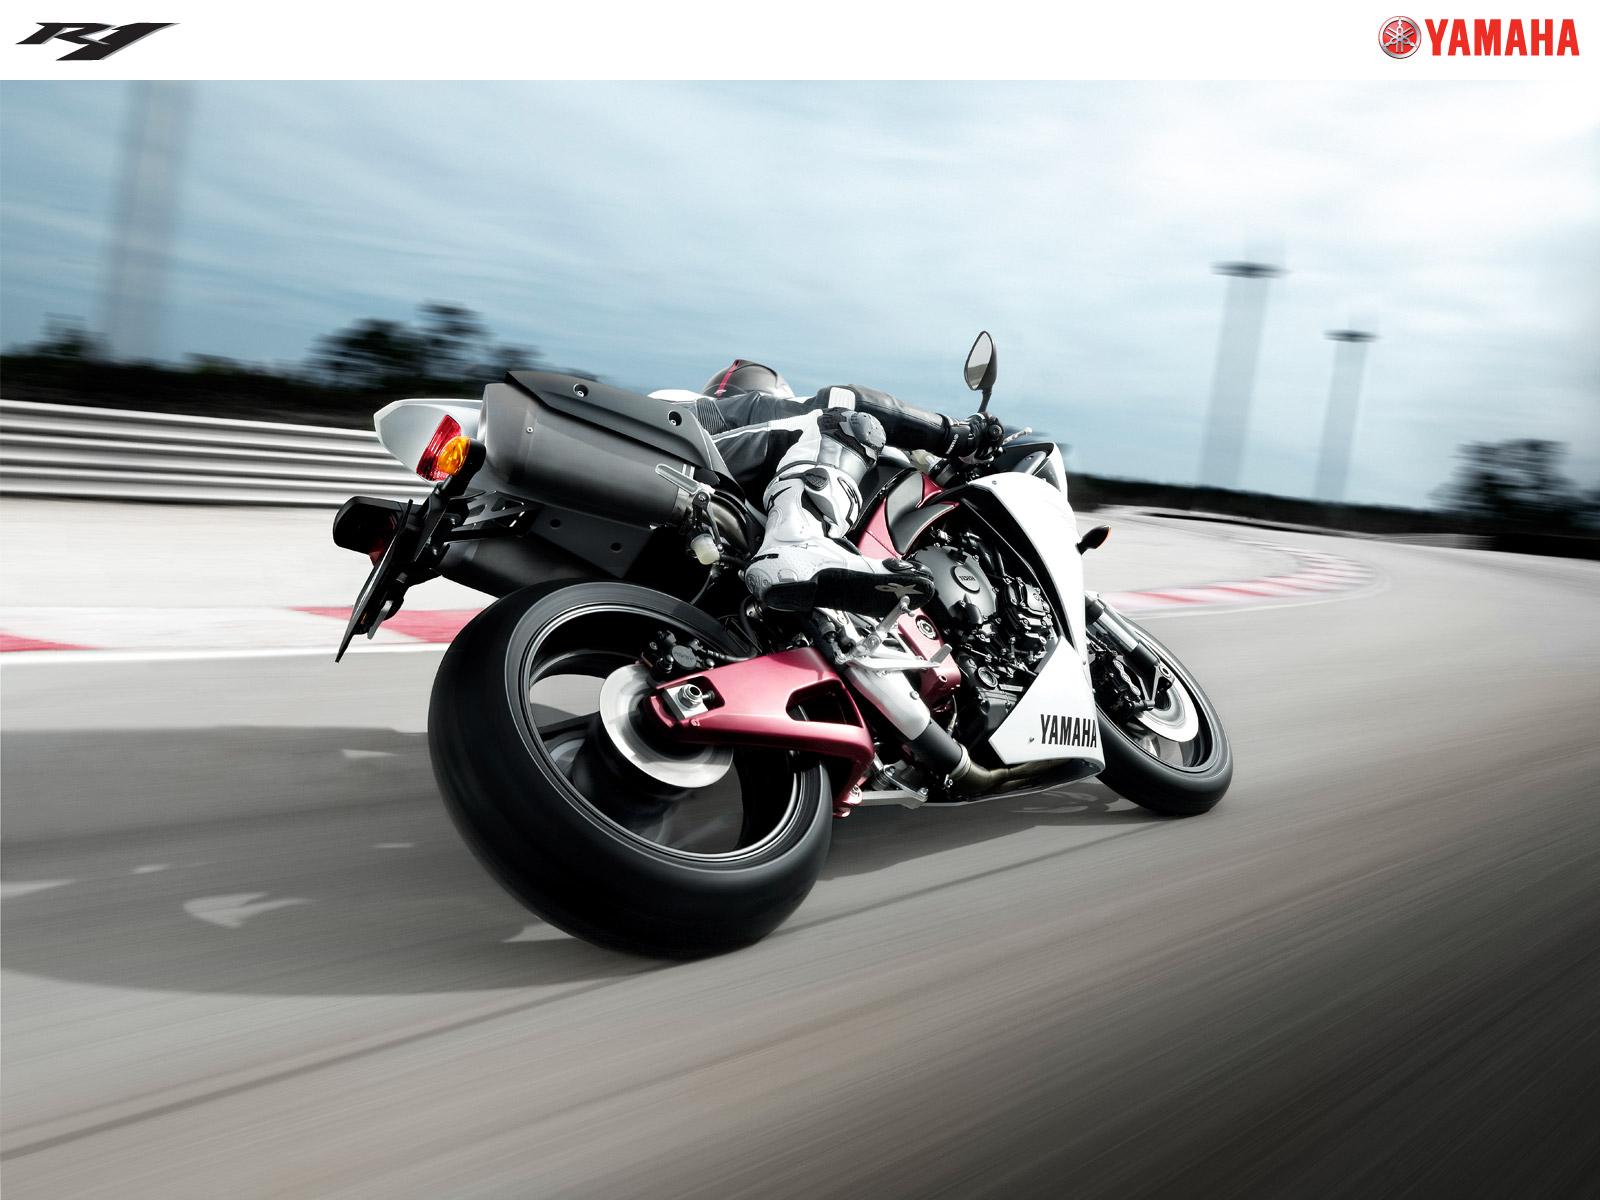 2009 Yamaha YZF R1 Bike Wallpapers HD Wallpapers 1600x1200